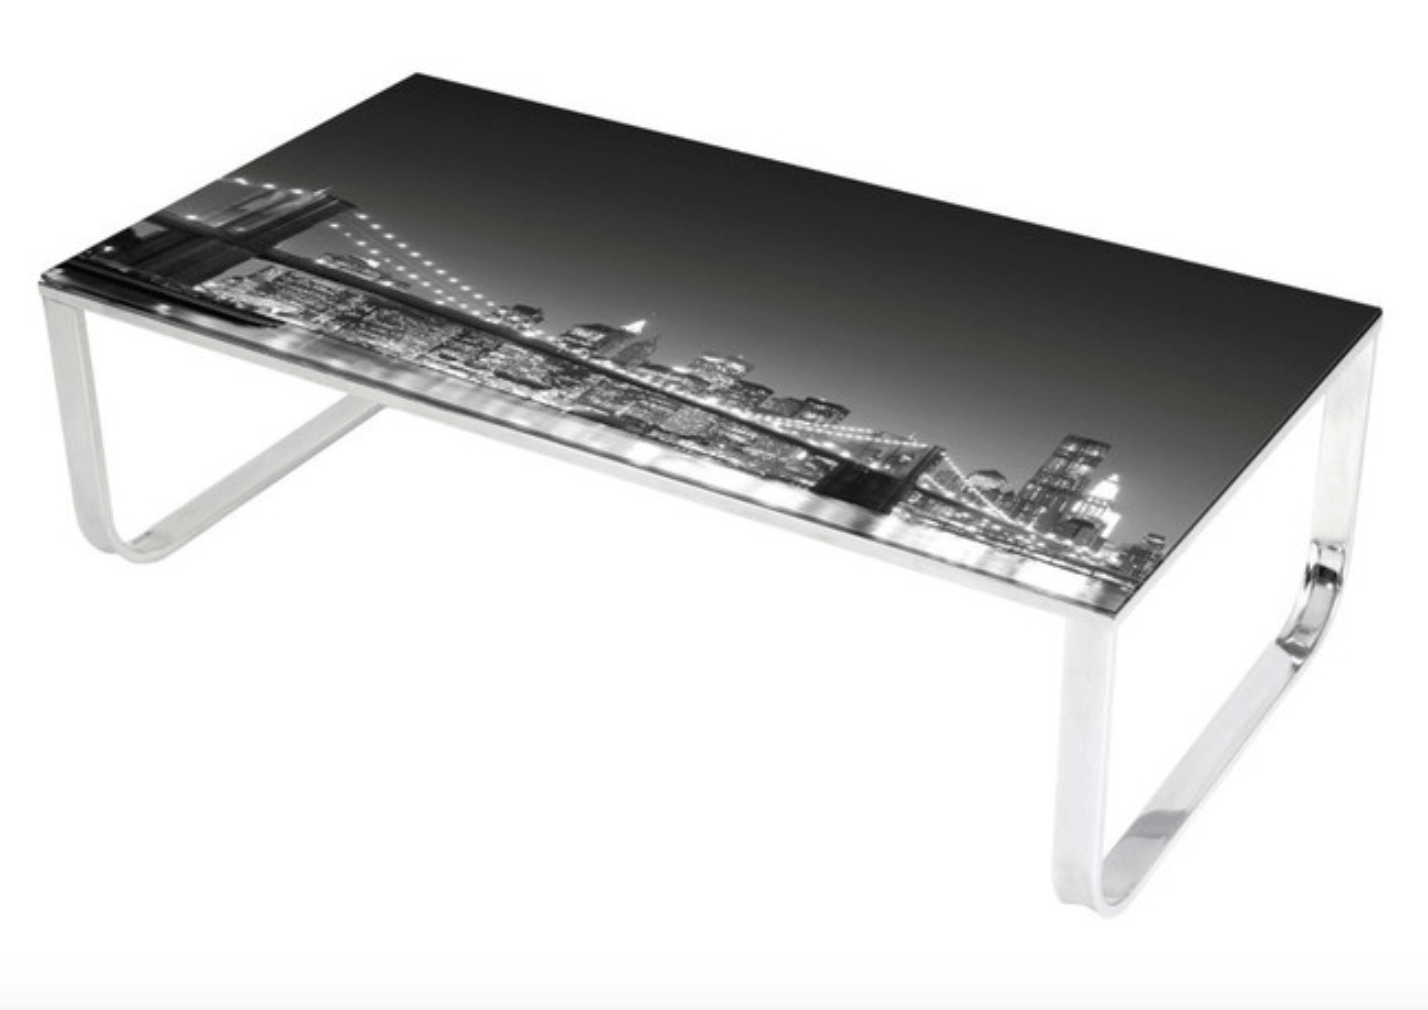 brooklyn-bridge-night-skyline-view-glass-coffee-table